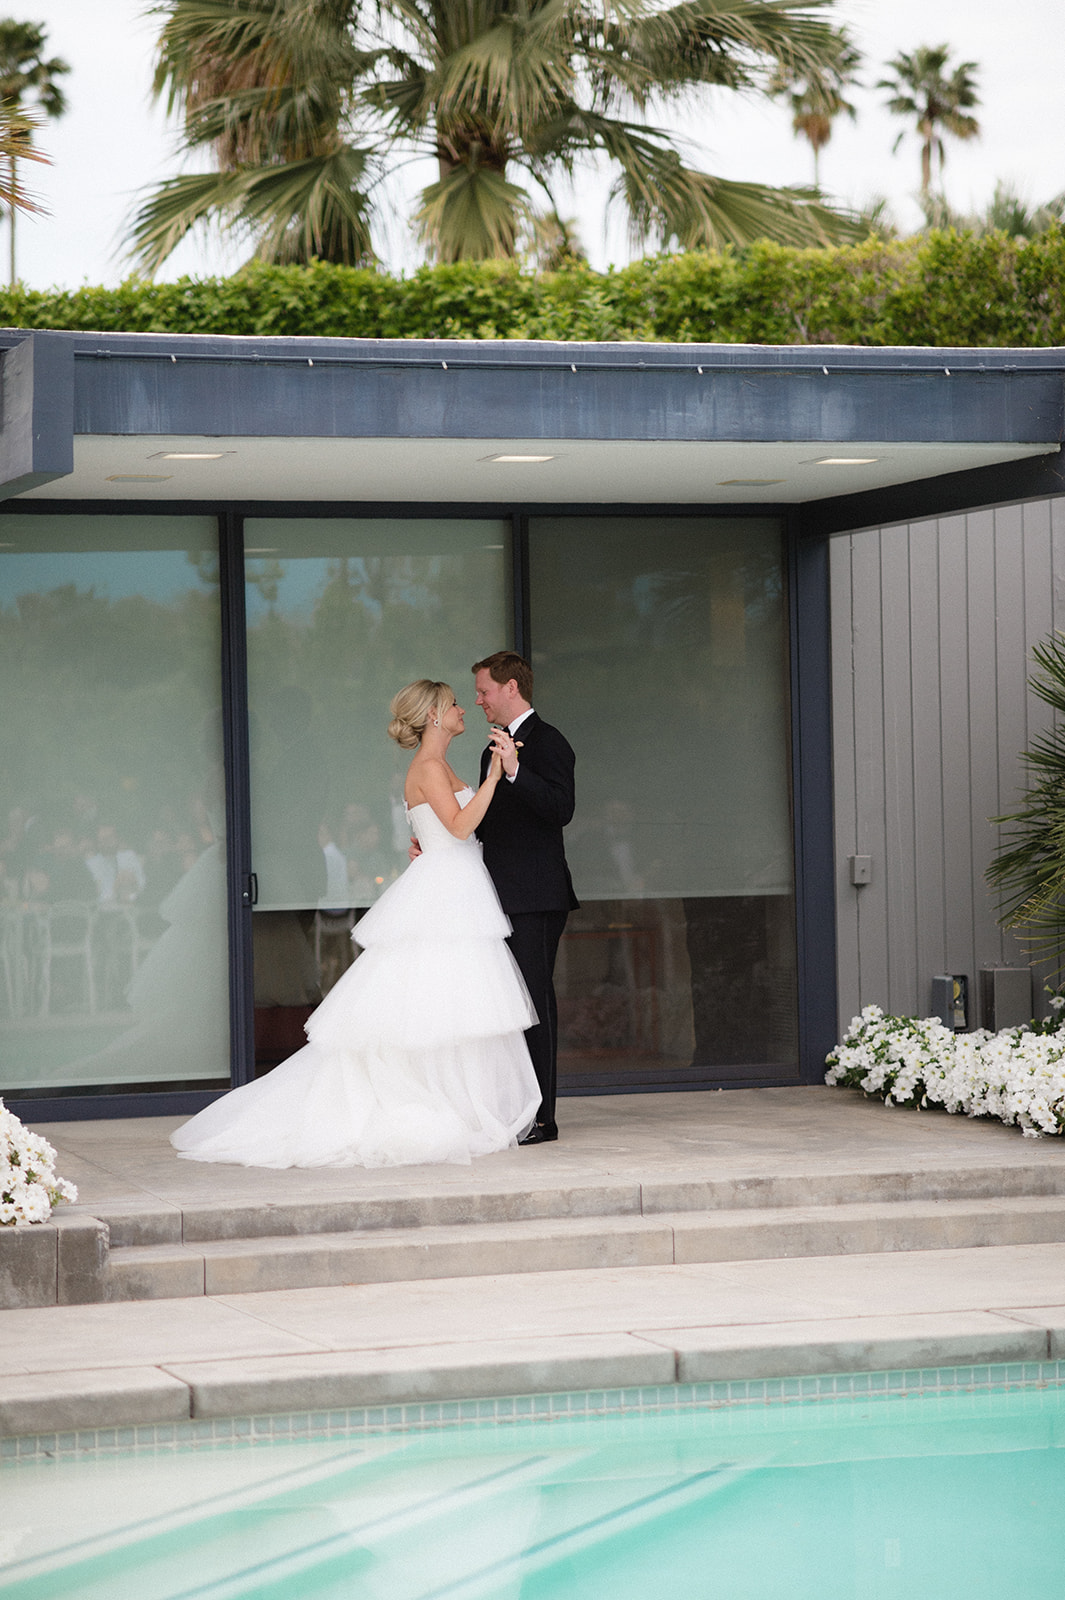 KL_WEDDING_0629.jpg